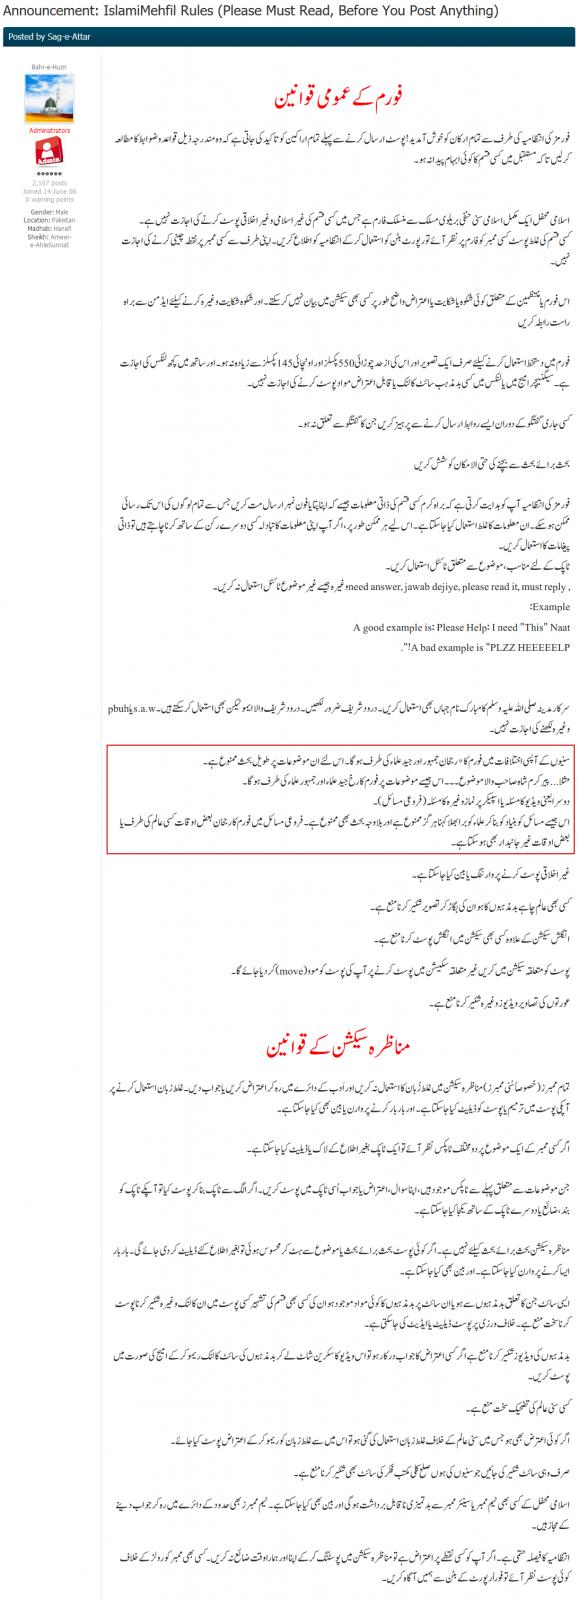 Forum-Rules-islamimehfil com 2015-10-01 18-19-16.png